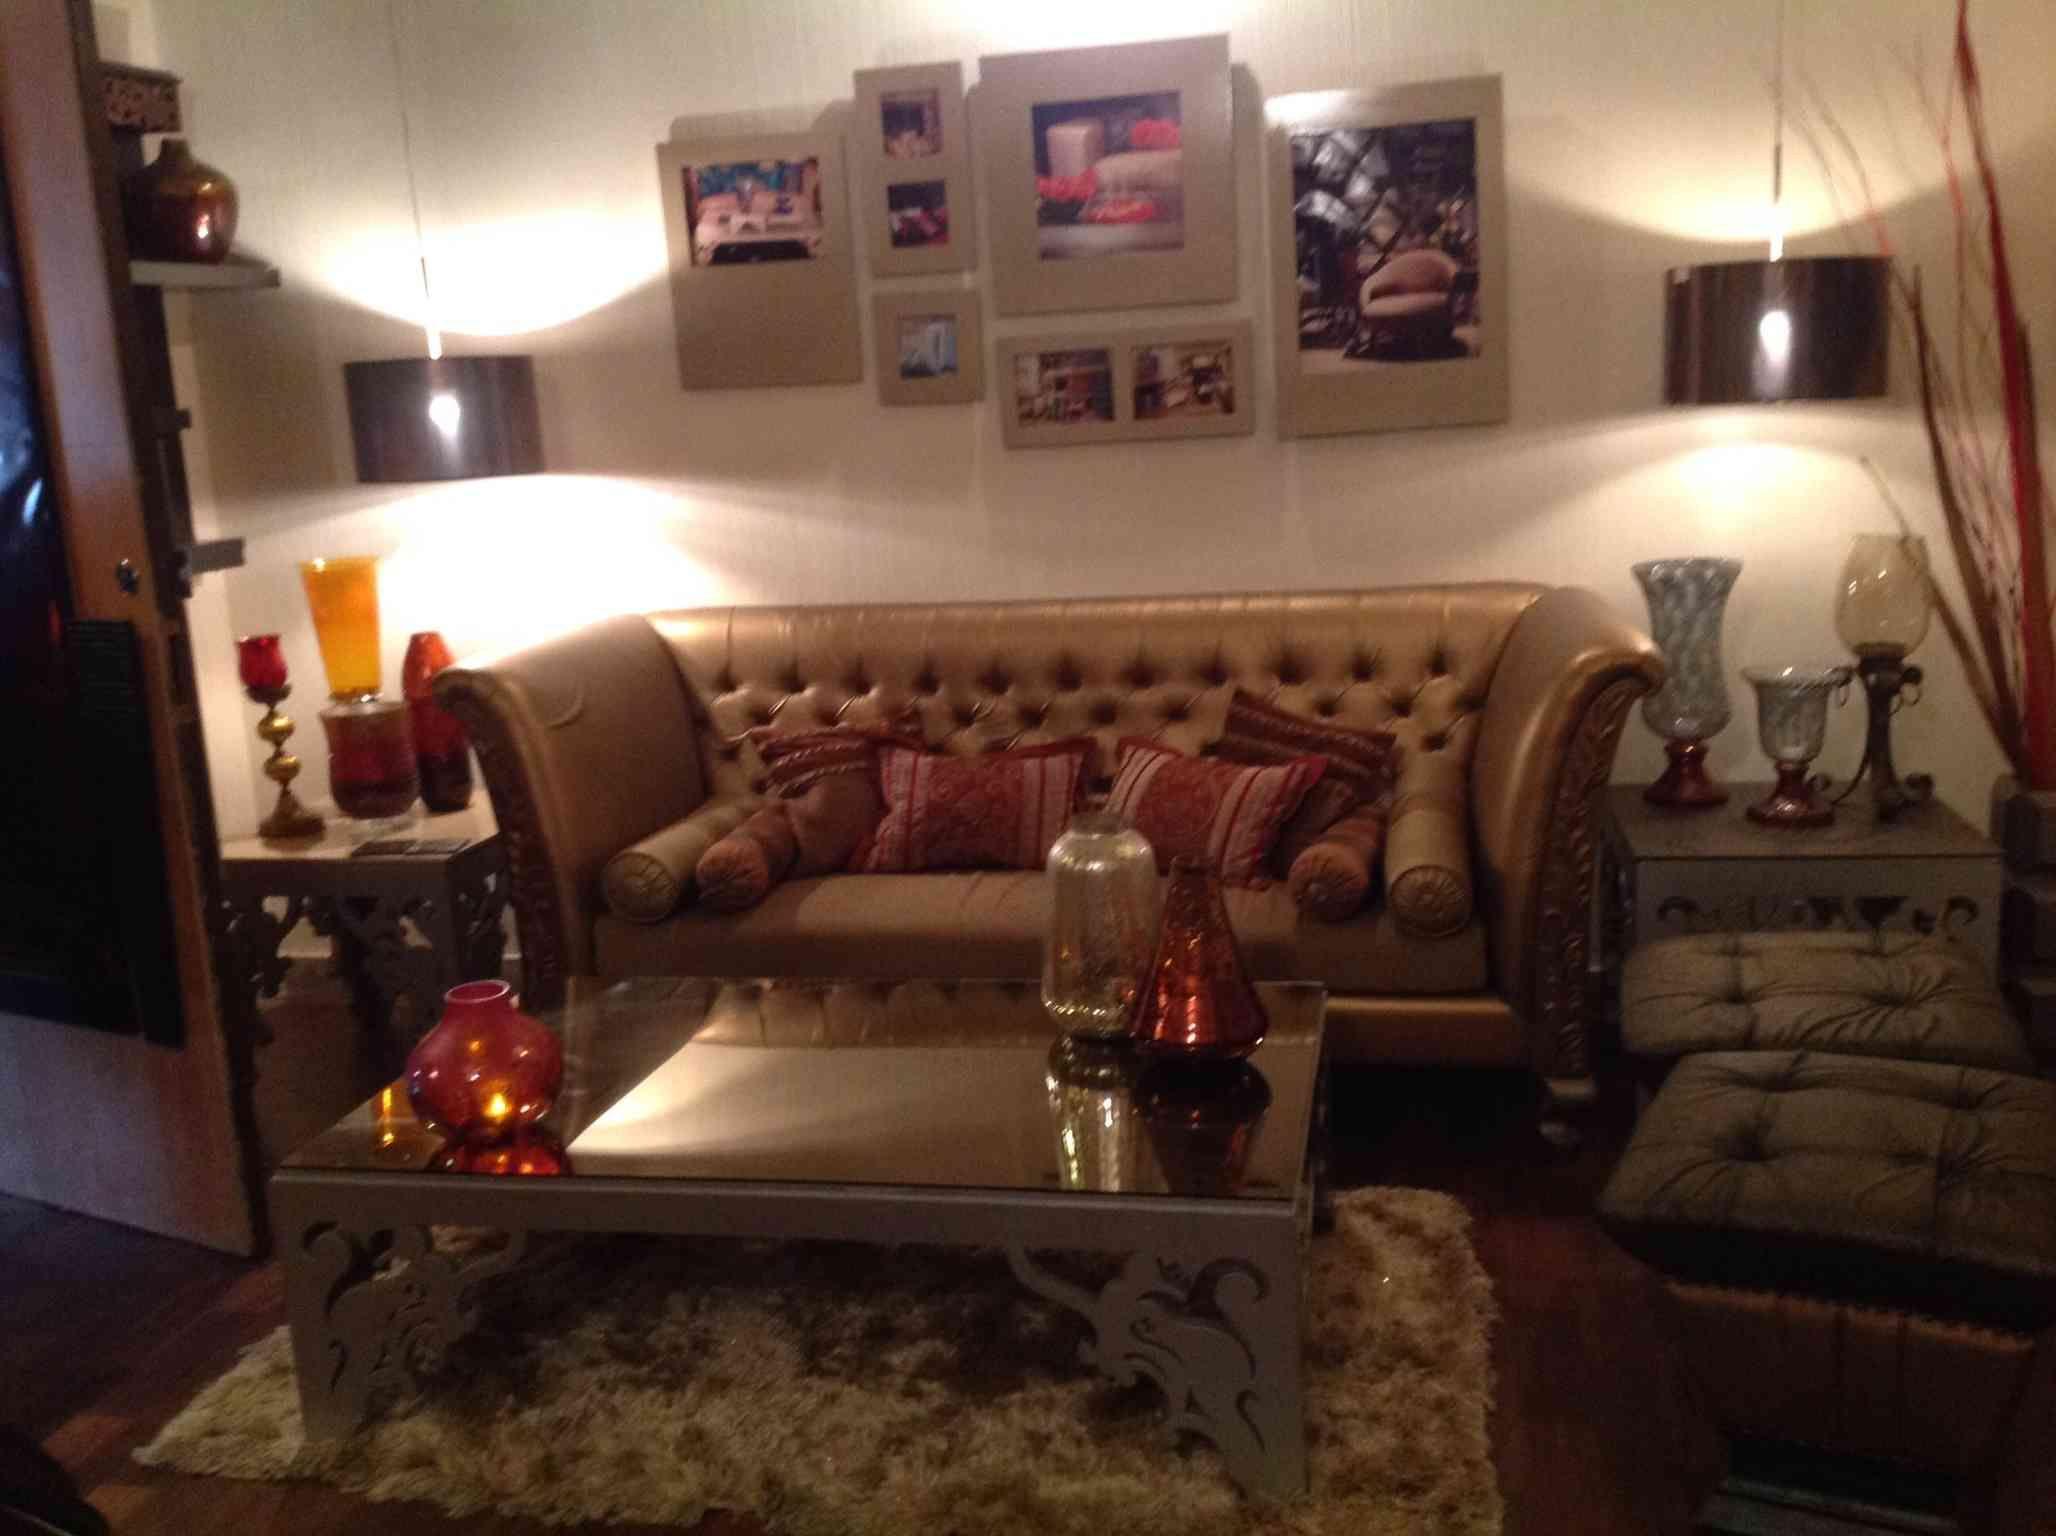 Living Room With Brown Tufted Sofa Designmadalsa Soni Impressive Indian Living Room Furniture Designs Design Inspiration